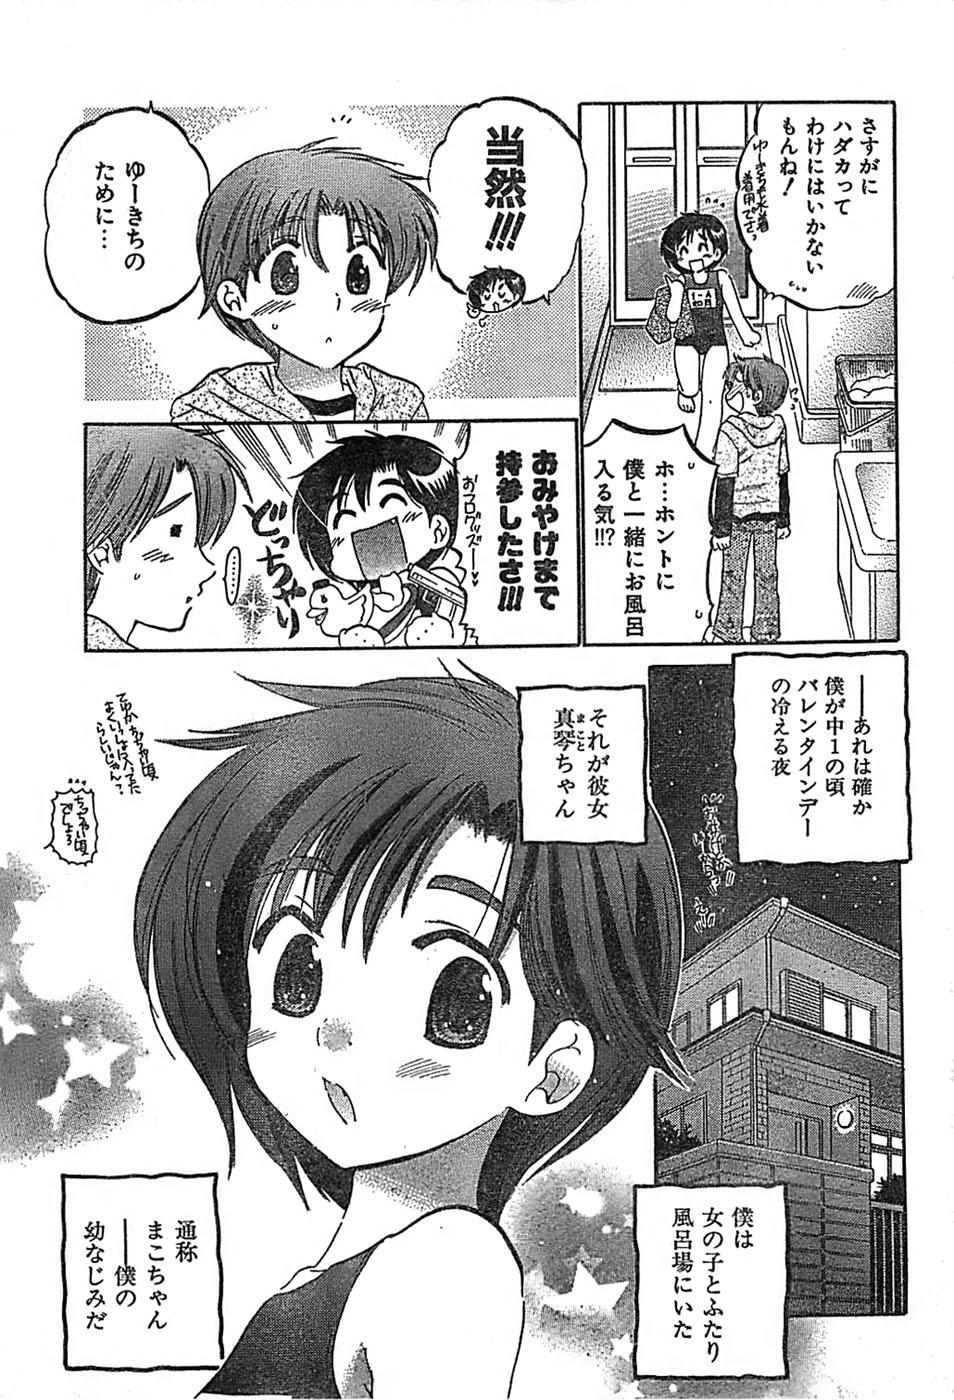 COMIC CanDoll 2007-03 Vol. 38 48